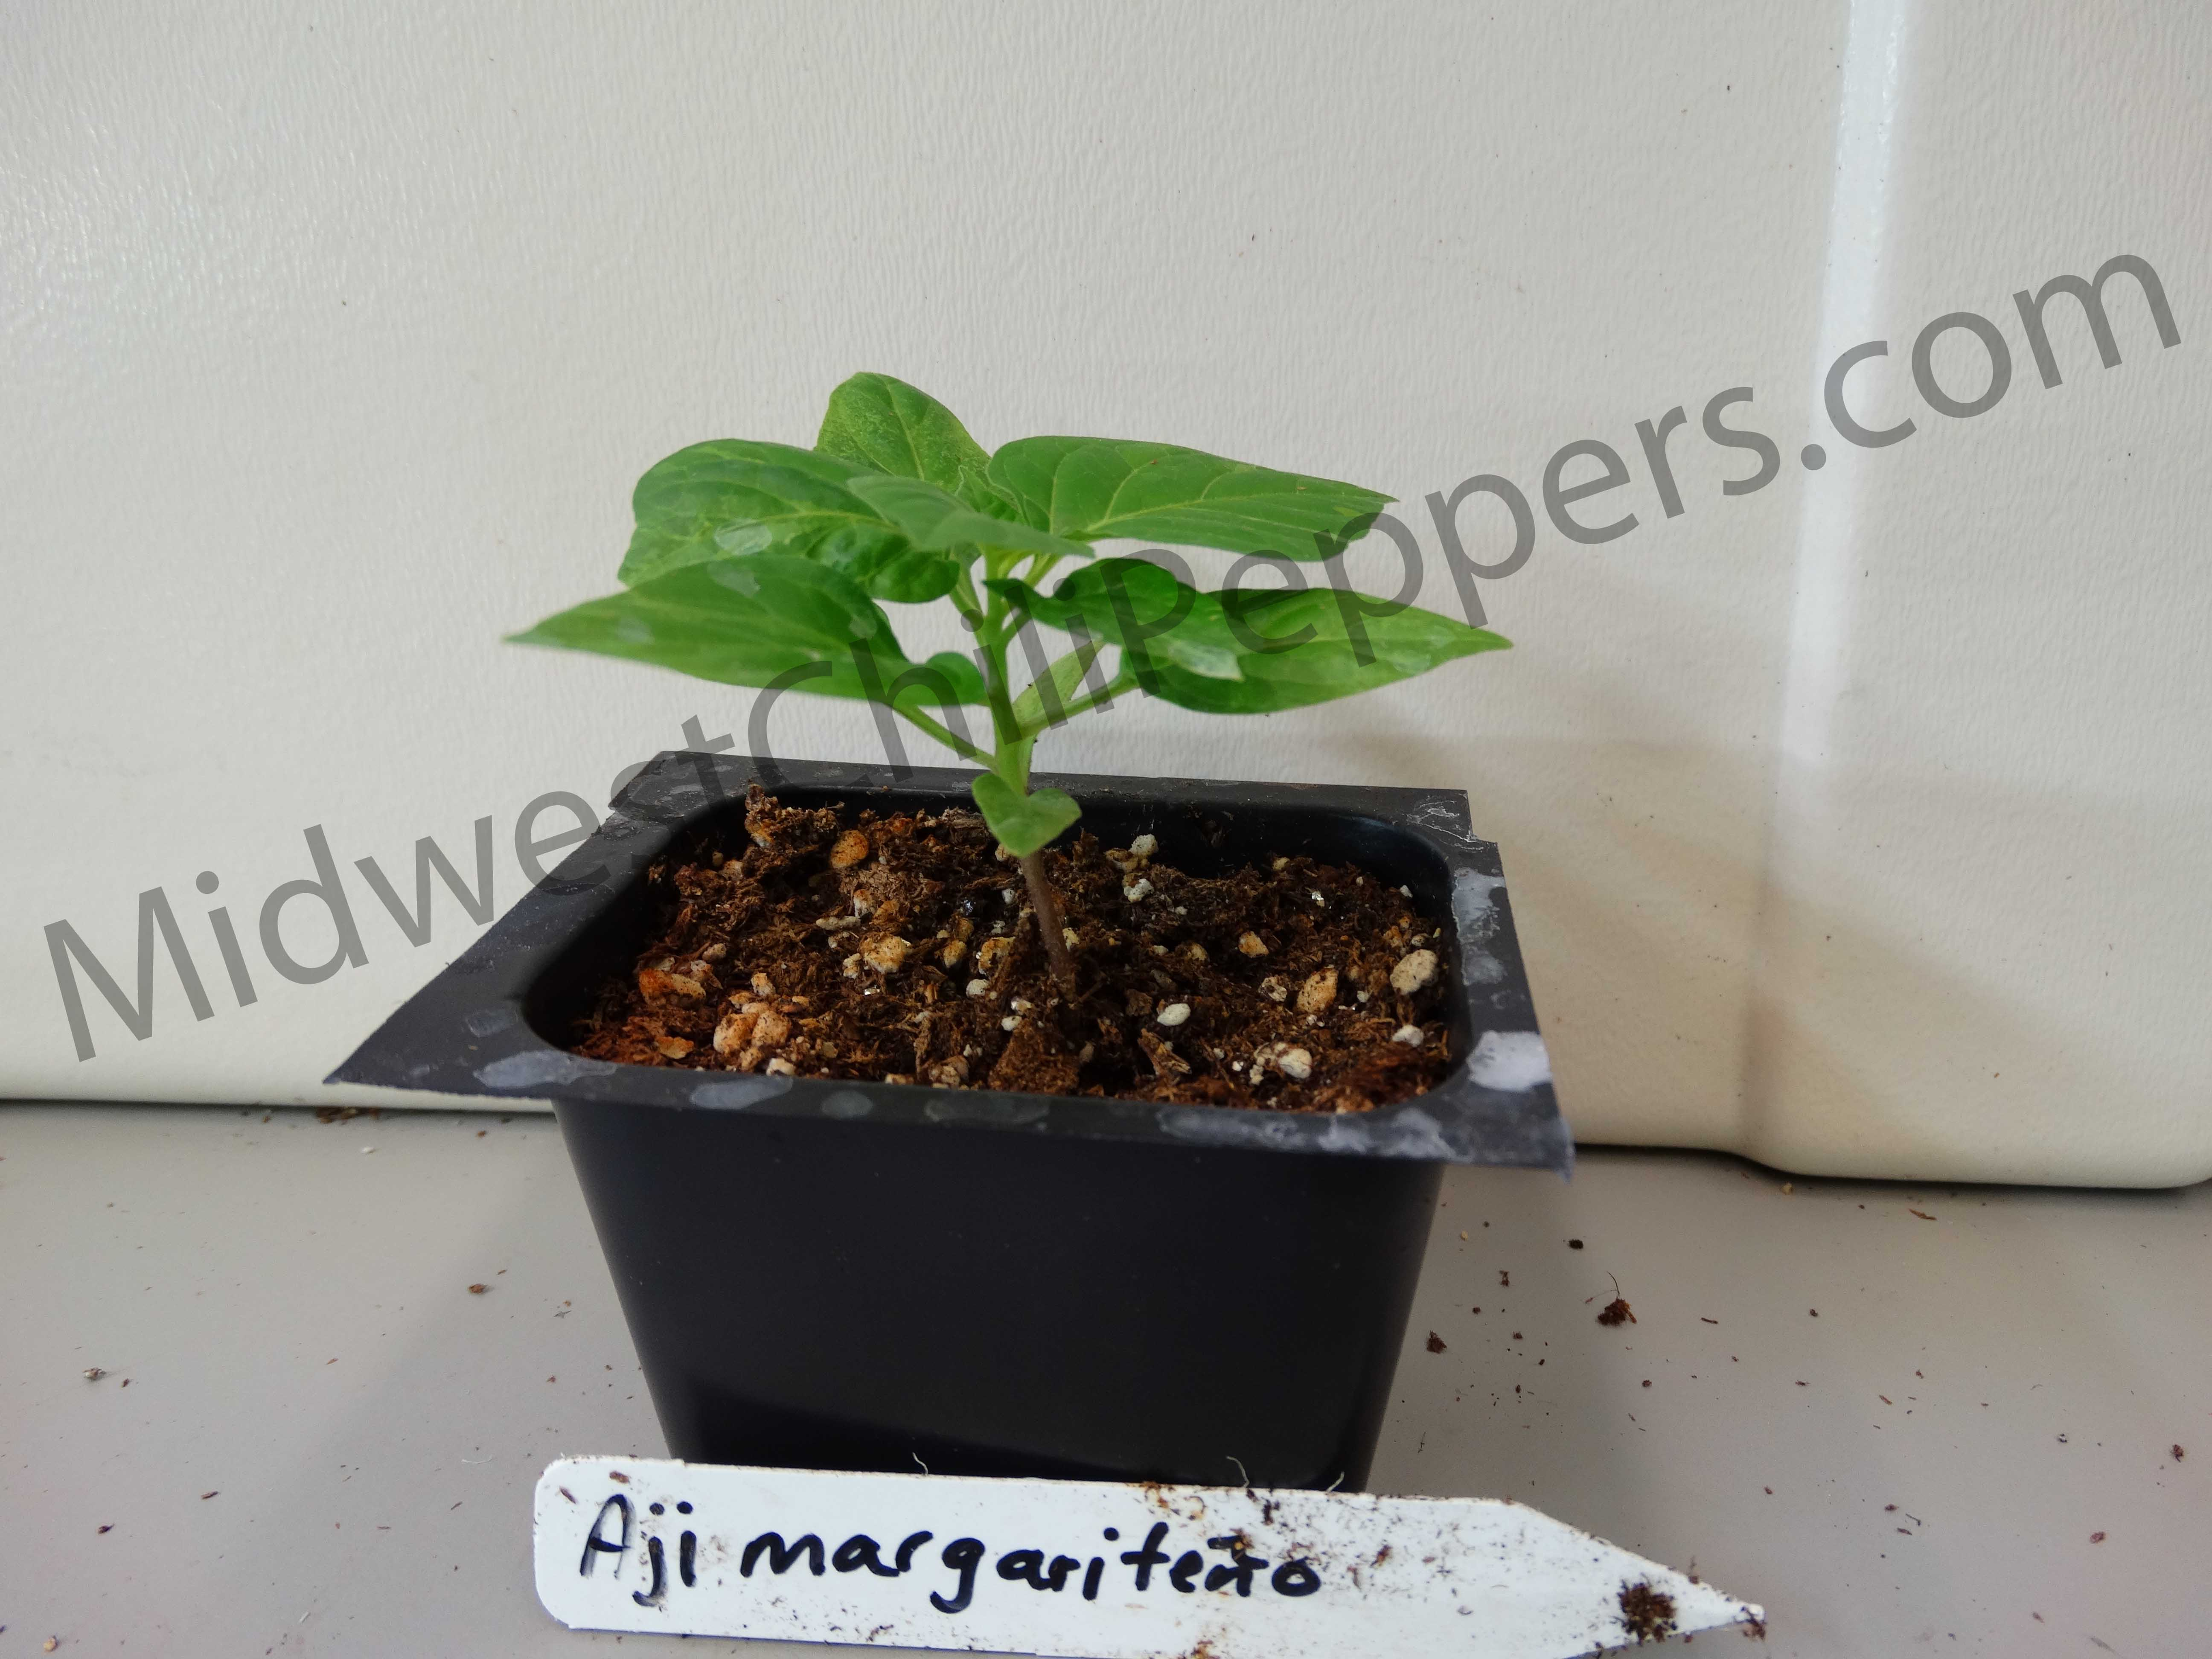 Aji Margariteno Seedling